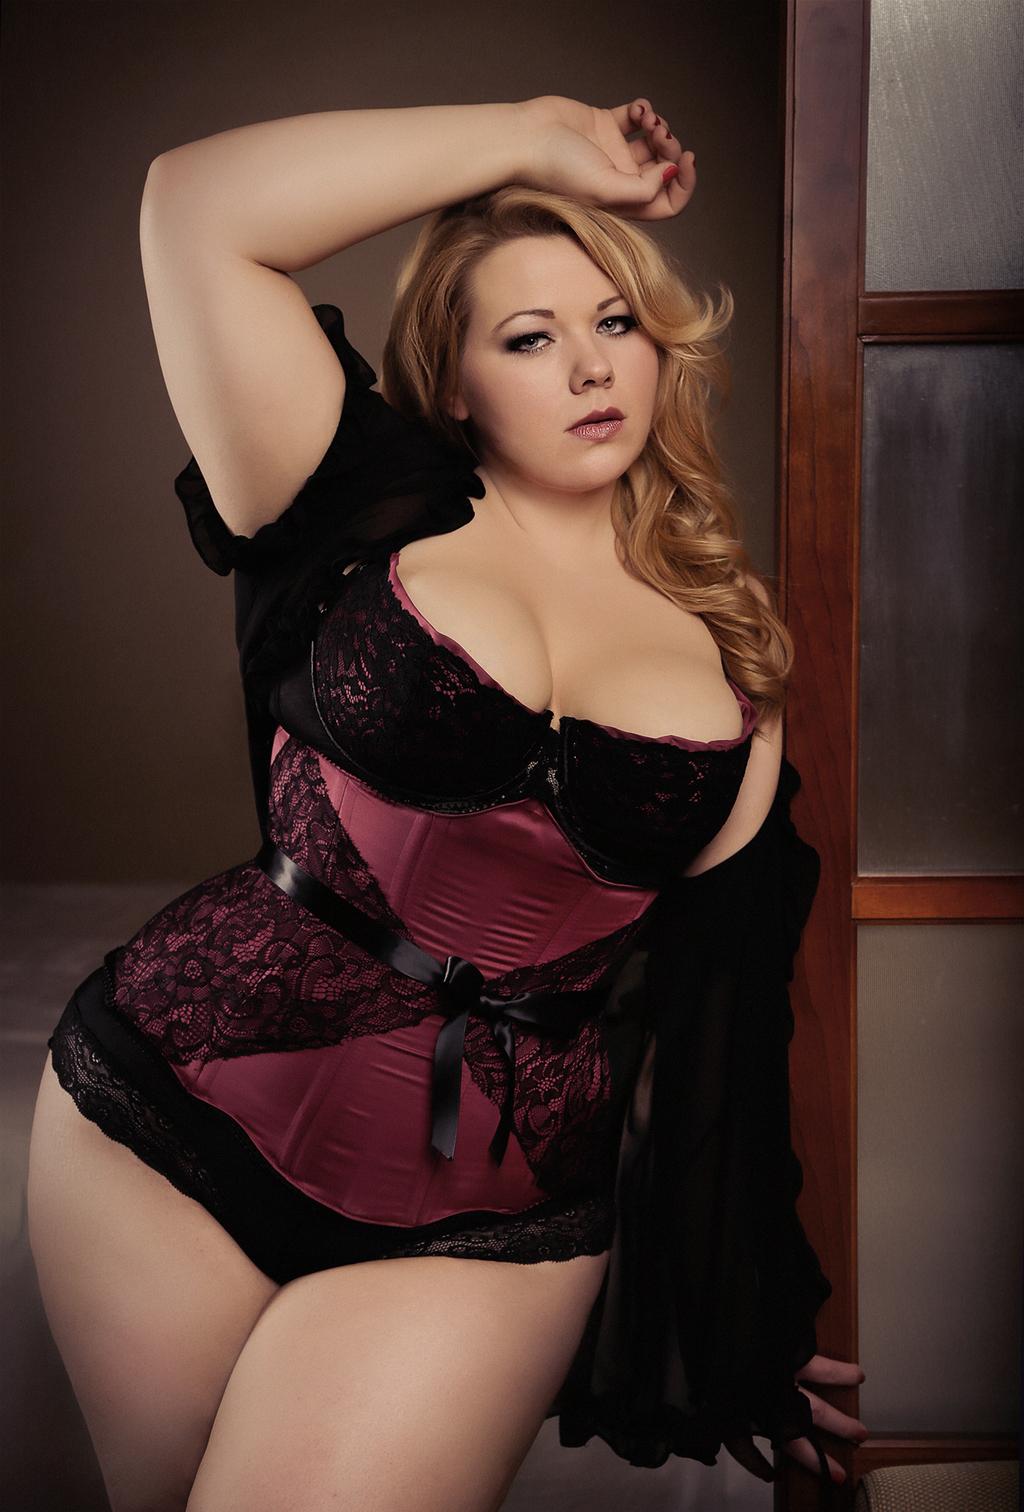 Sexy plump woman sitting on pink background stock photo